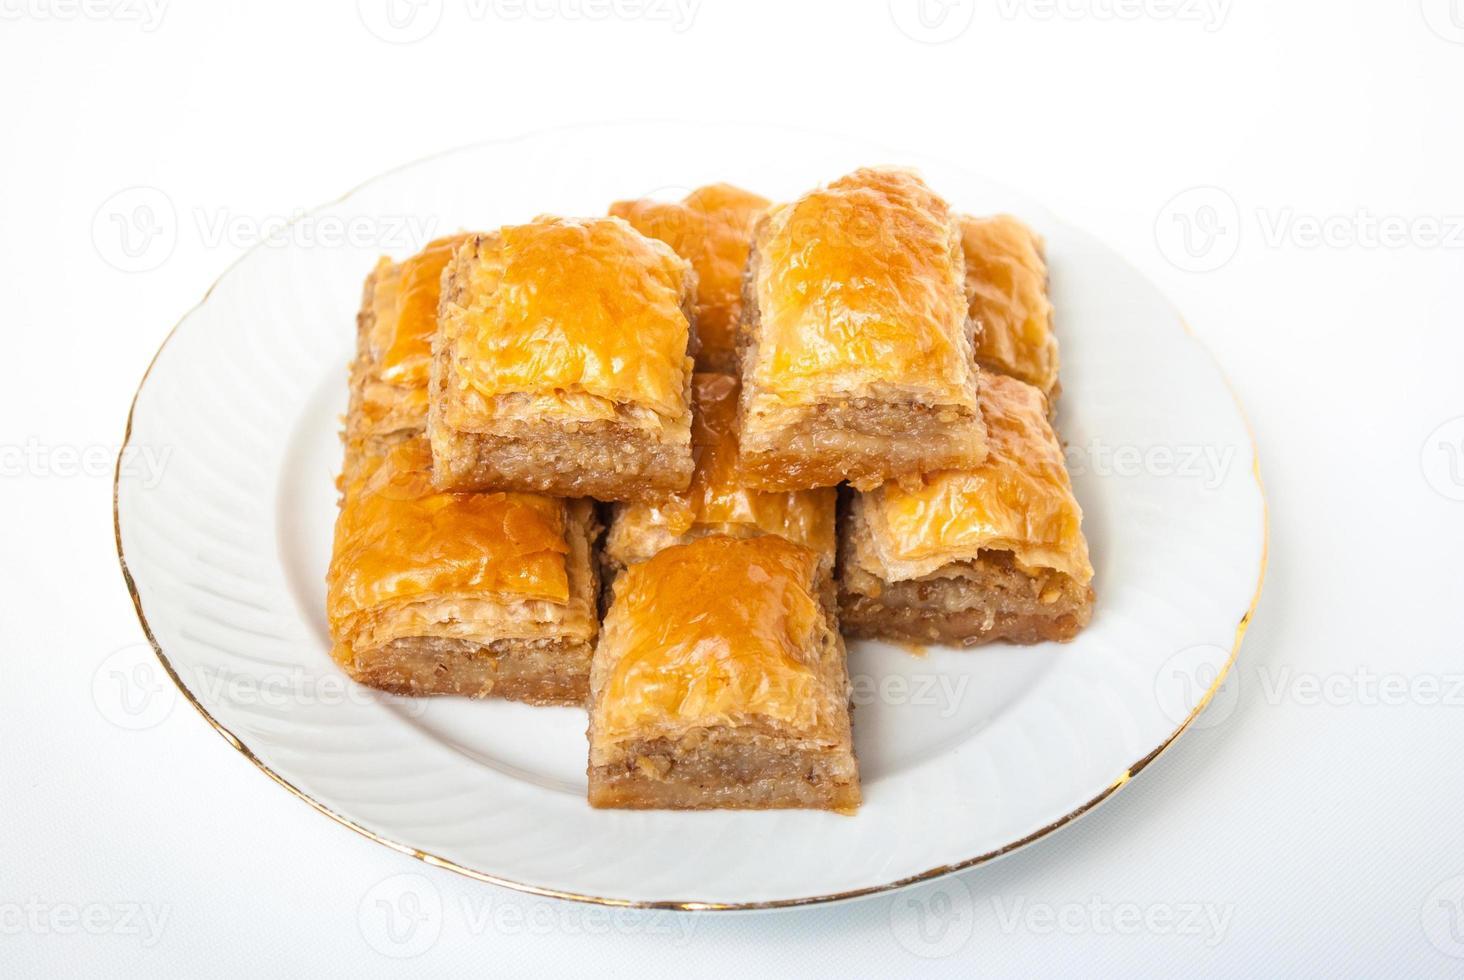 baklava doce no prato isolado no fundo branco. foto